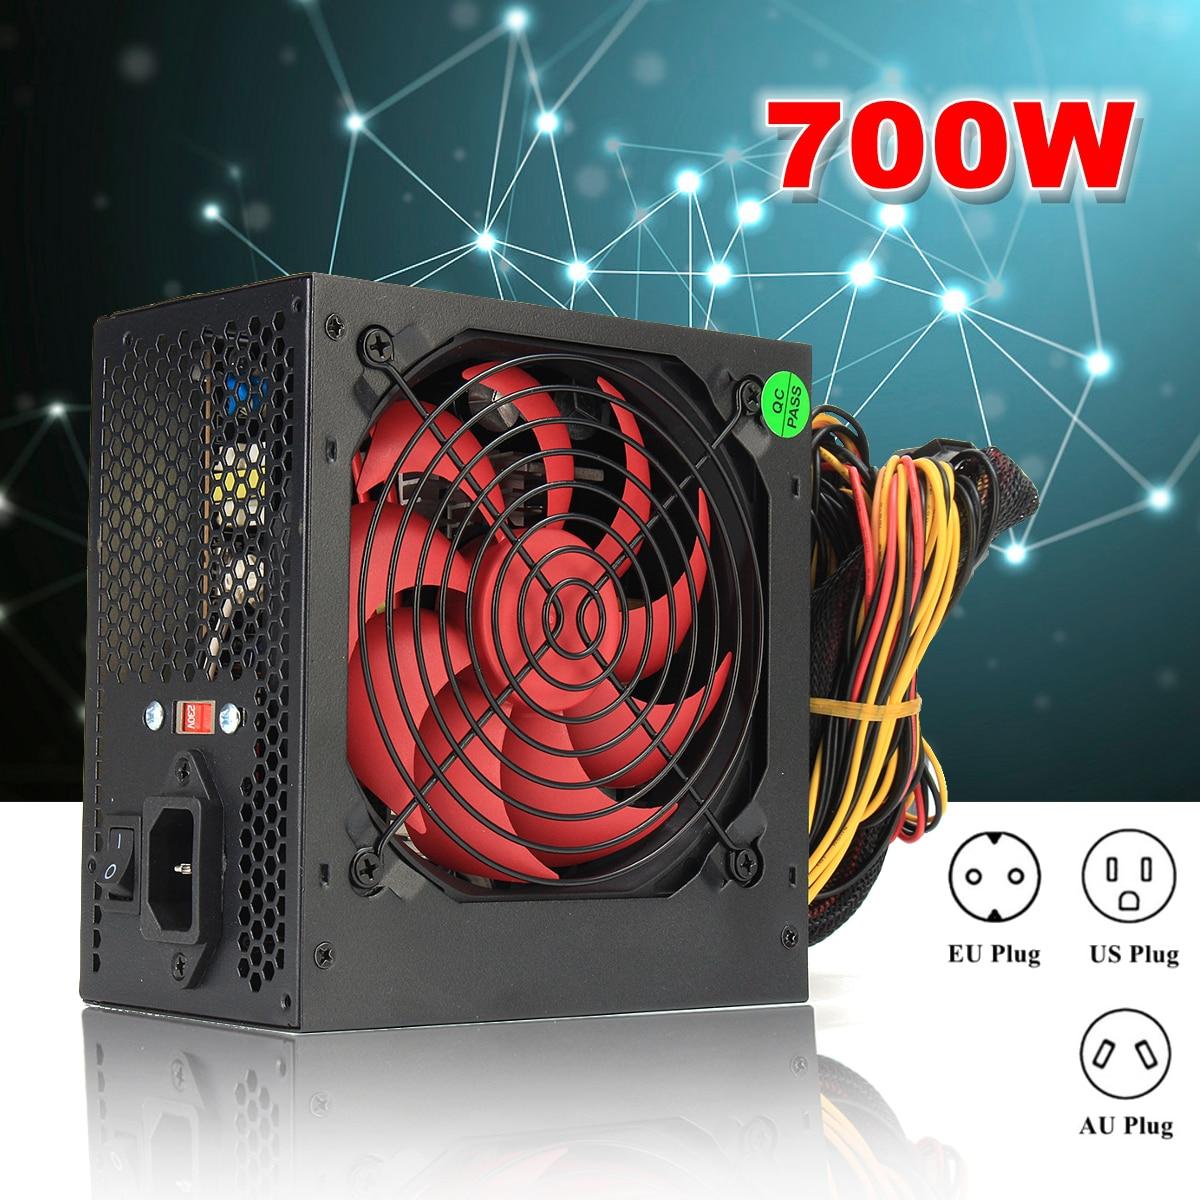 UE/AU/US enchufe MAX 700 W PCI SATA ATX 12 V Gaming PC alimentación 24Pin/ molex/Sata 700 Walt 12 cm equipo ventilador alimentación para BTC